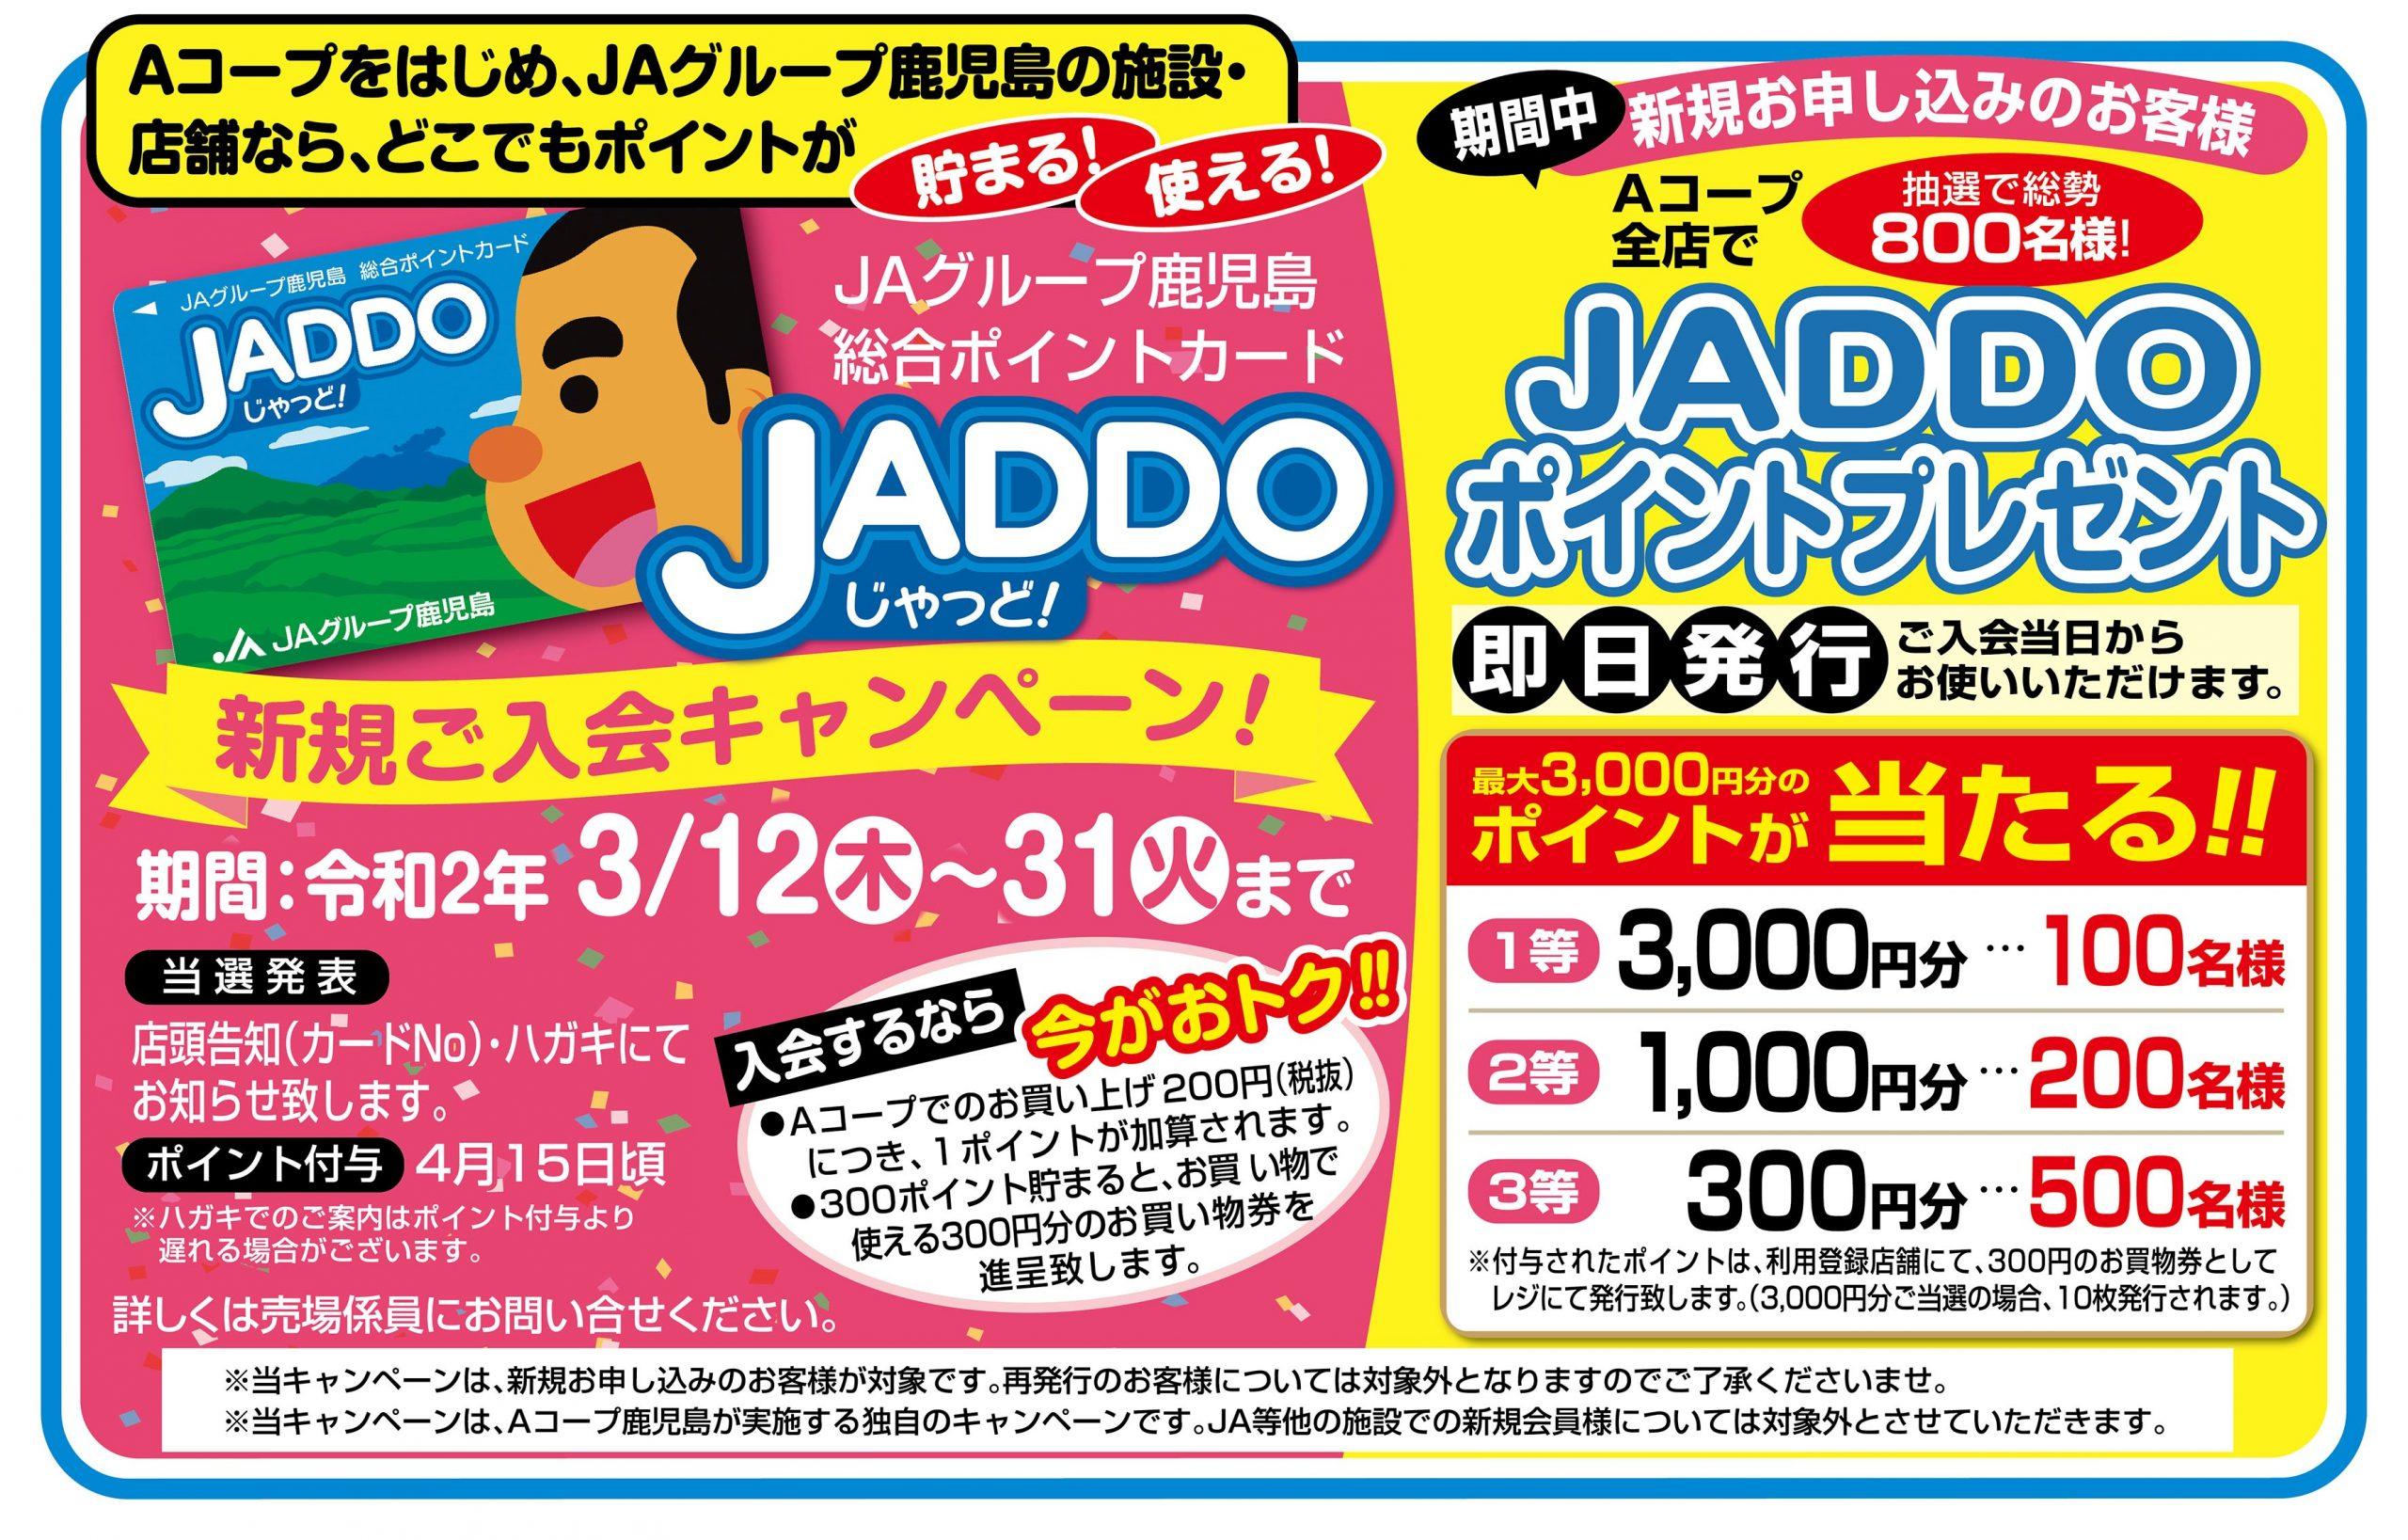 JADDOカード 新規ご入会キャンペーン2